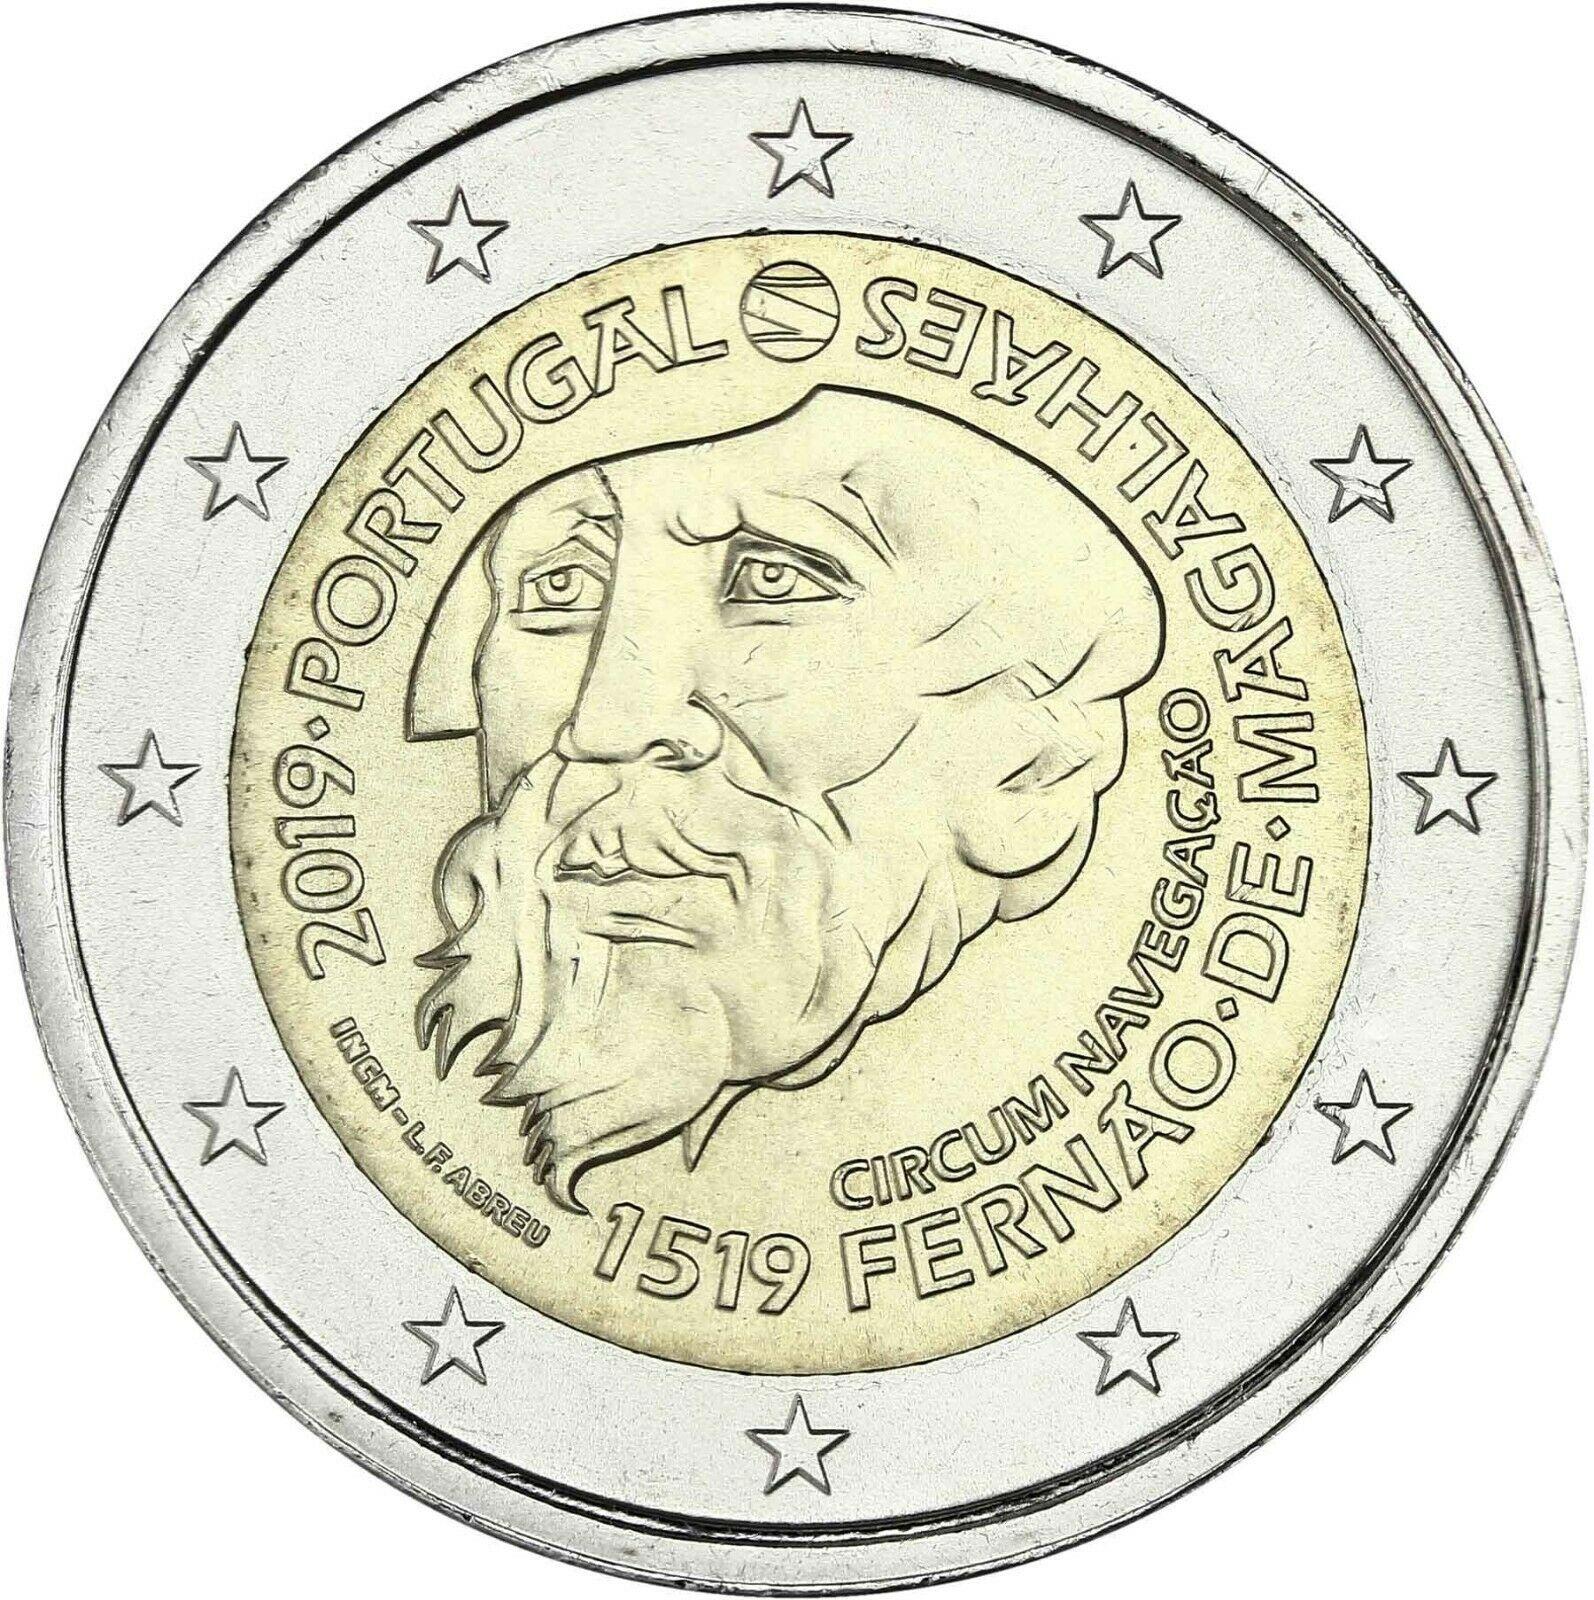 Португалия 2 евро 2019 г. 500-летие кругосветного плавания Магеллана